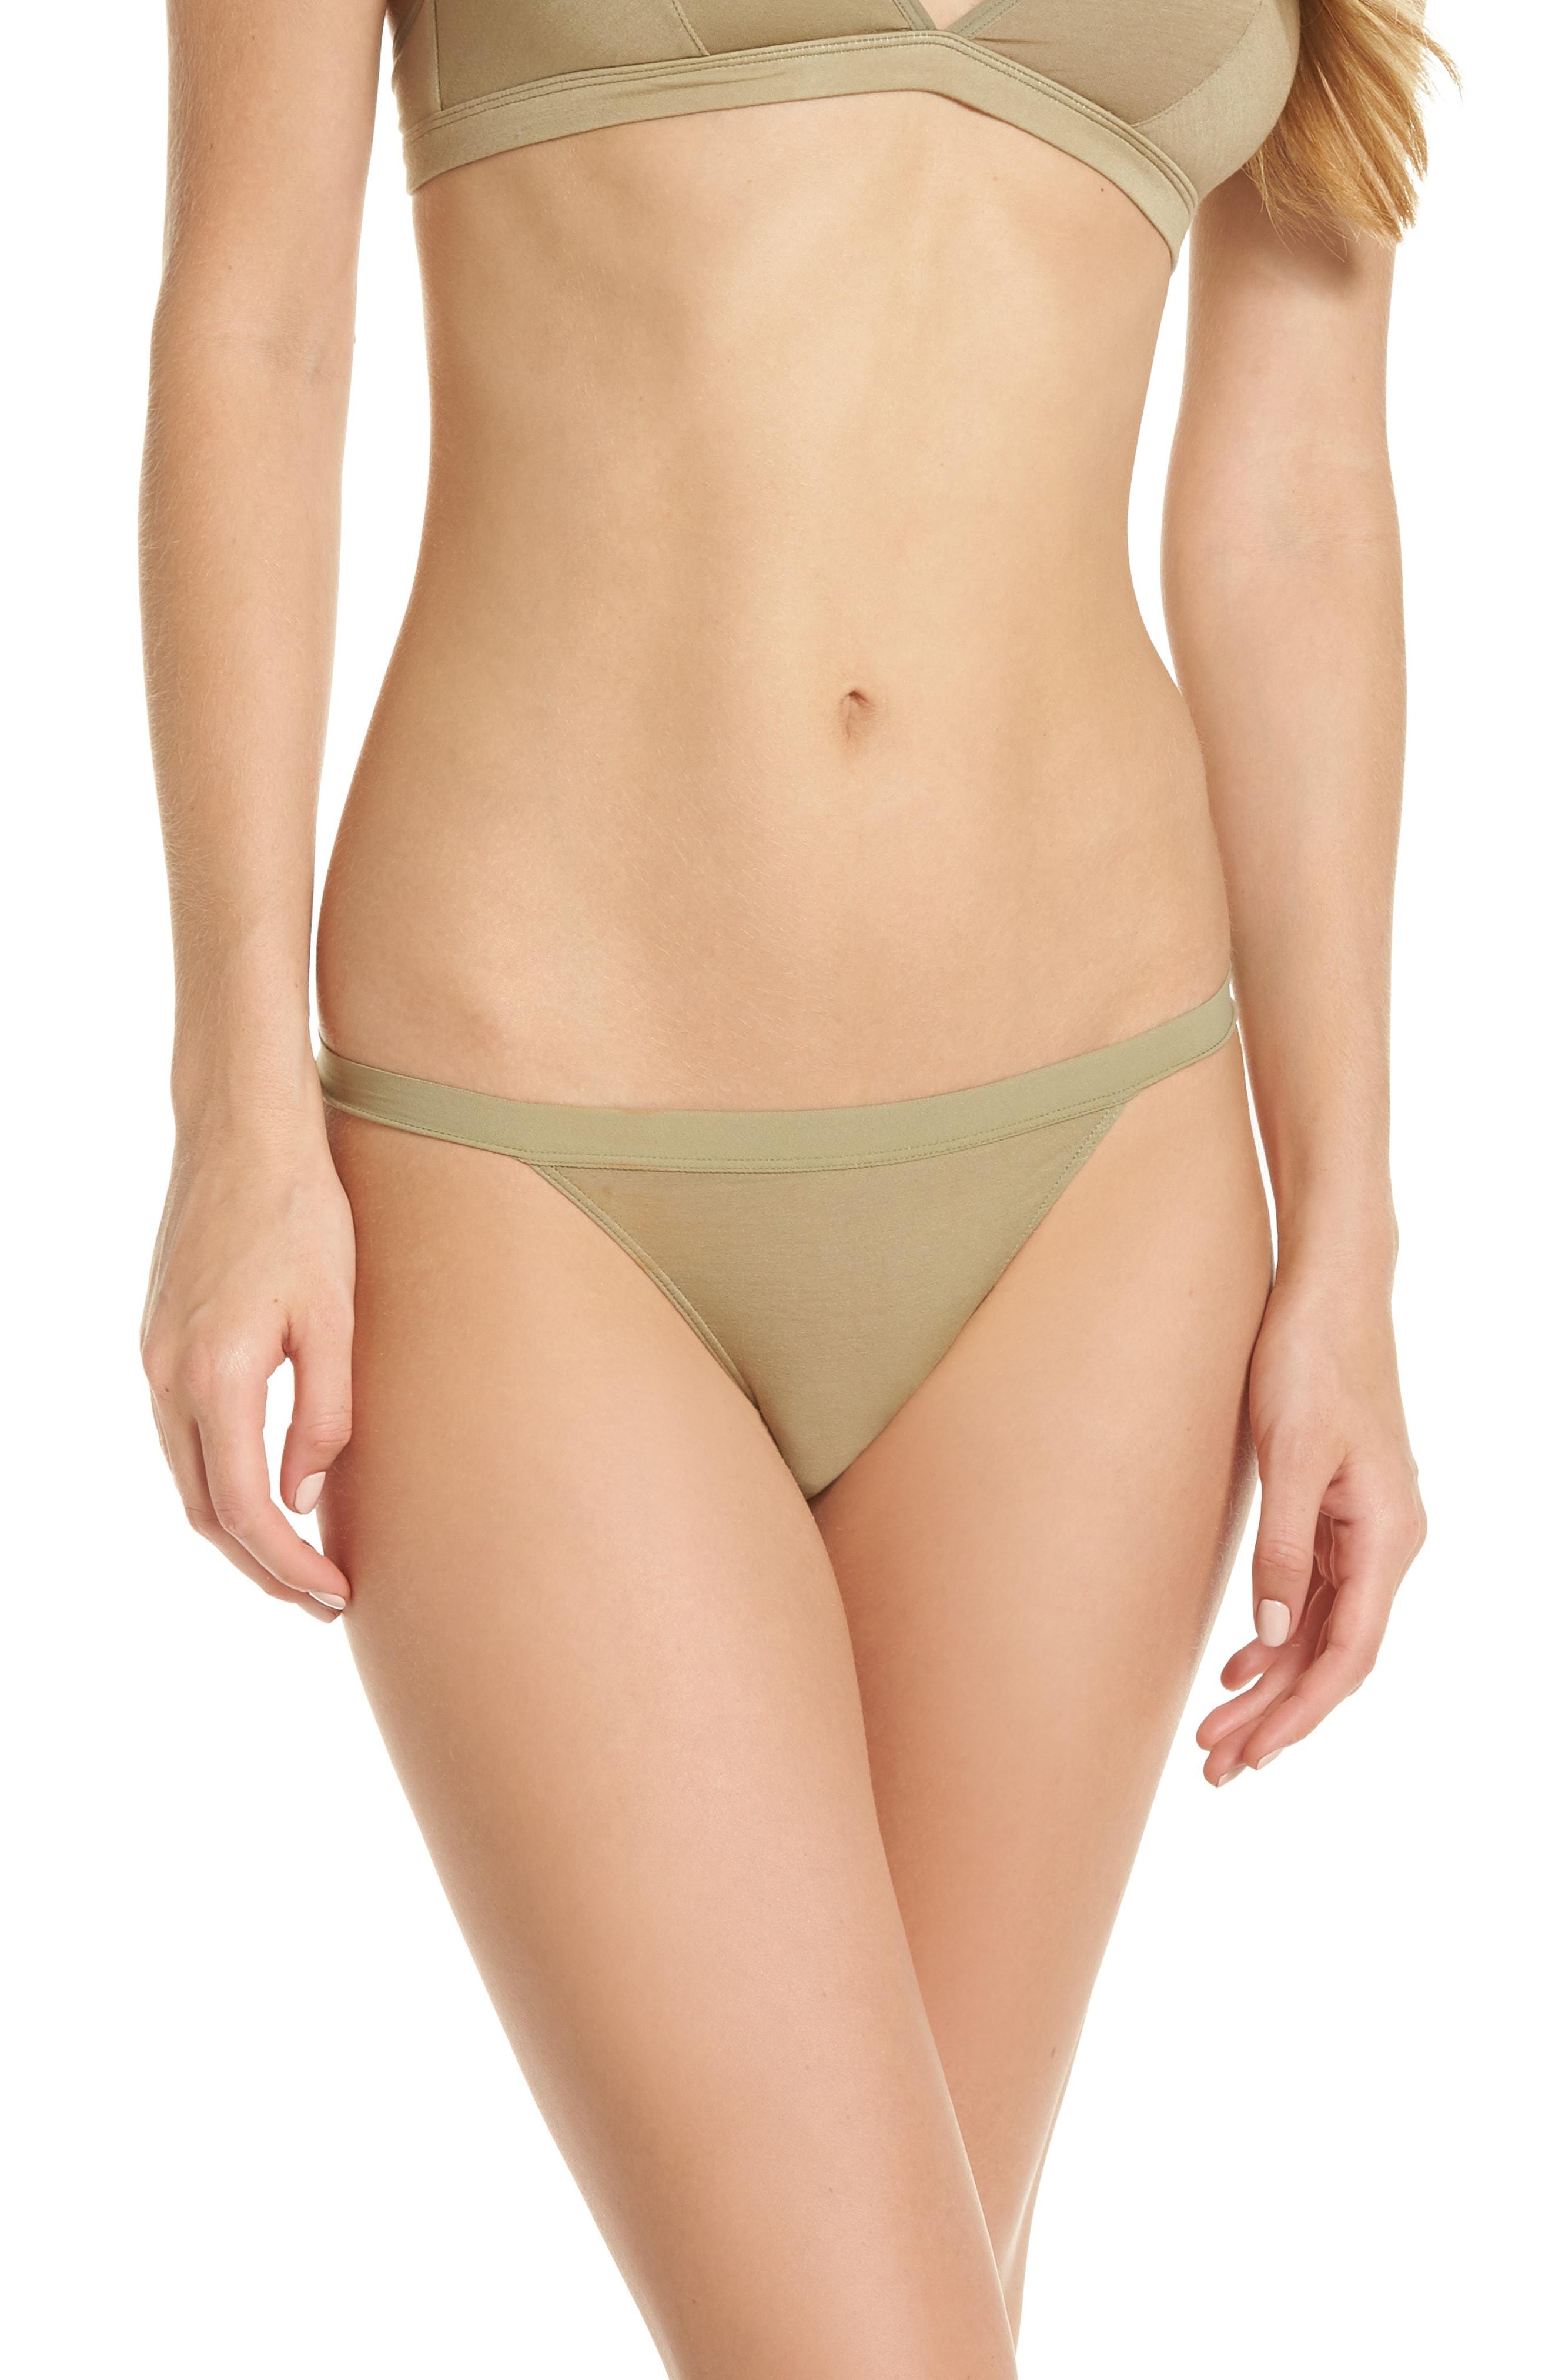 Madewell Micromodal String Bikini (3 for $33)